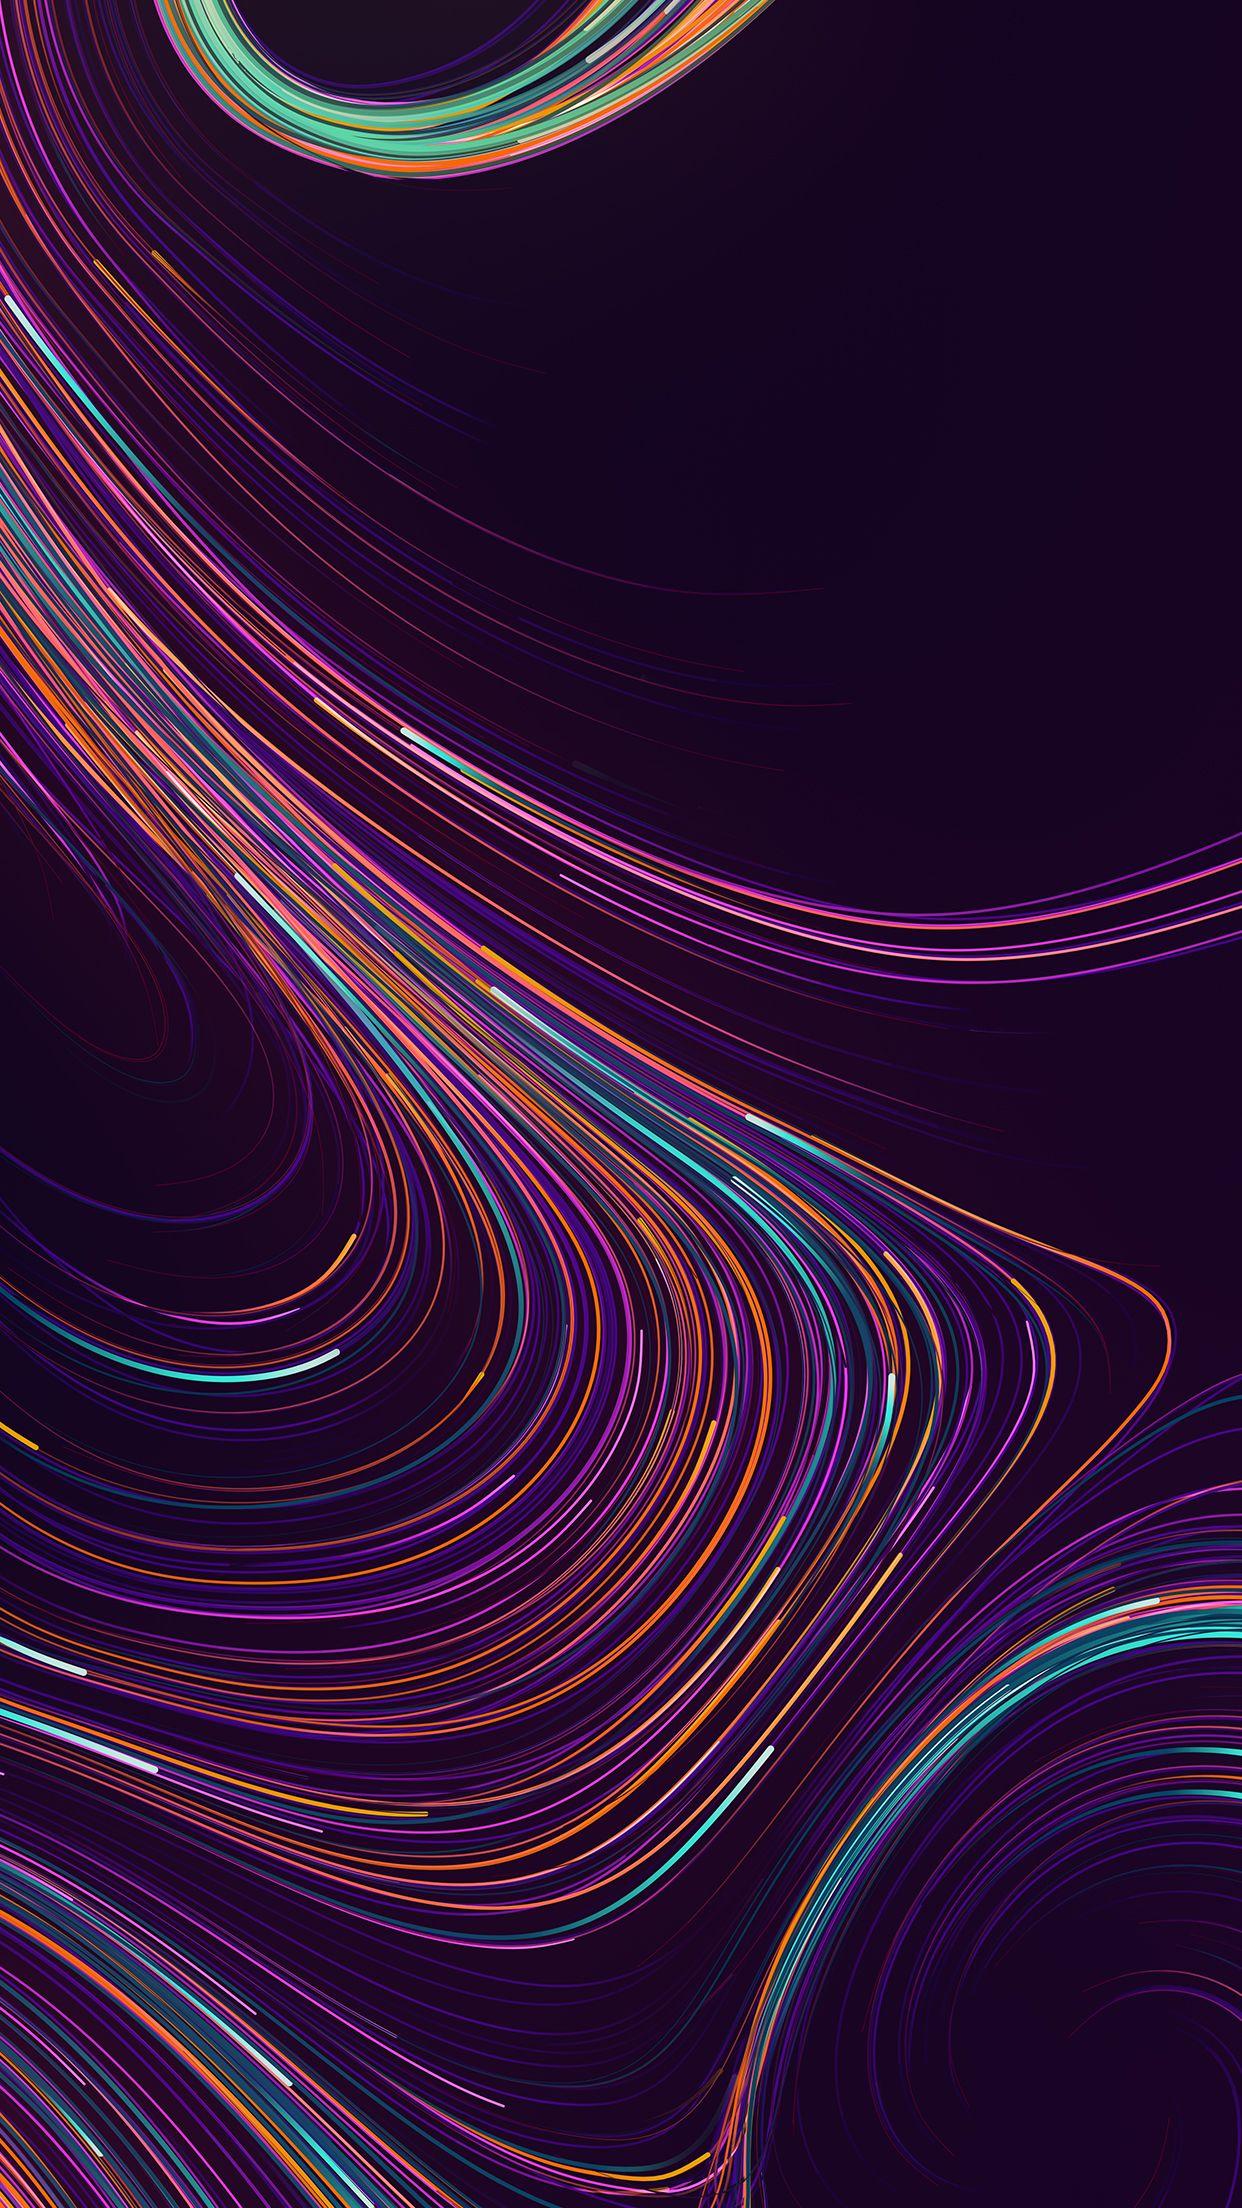 Strange Swirls Oc 1242x2208 Bonus Sizes In Comments Phone Wallpaper Iphone Homescreen Wallpaper Colorful Wallpaper